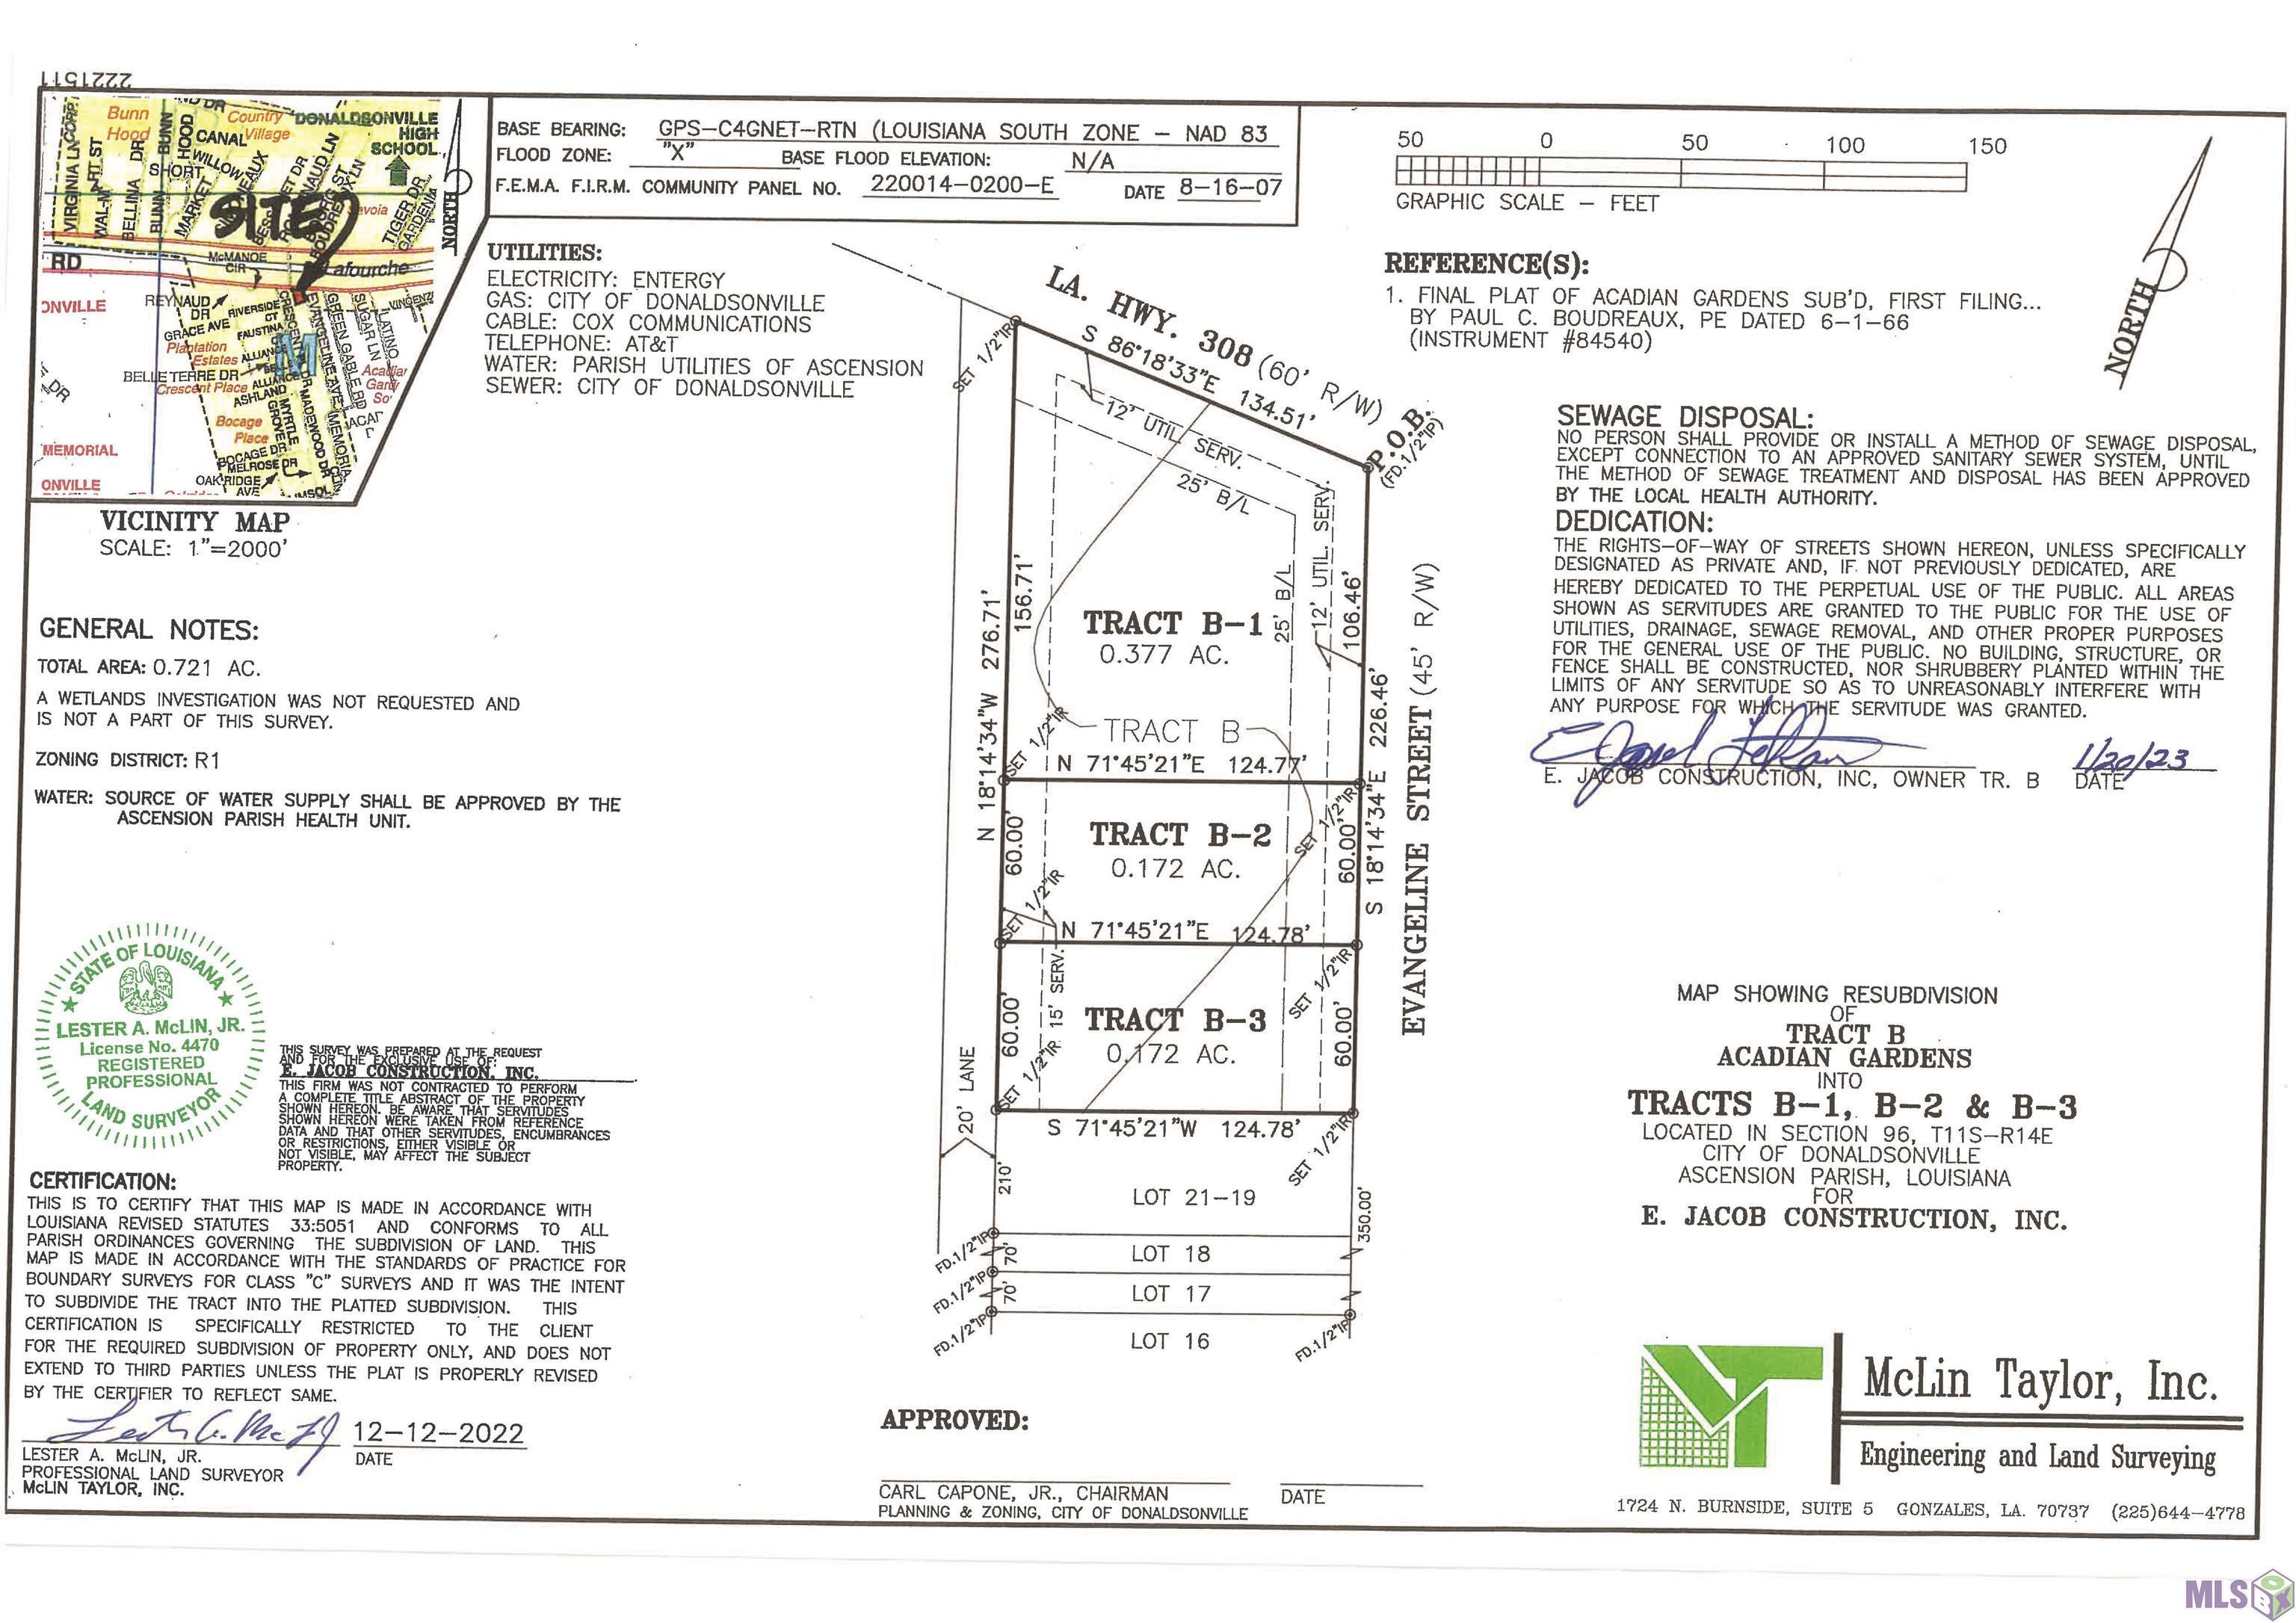 Proposed Lot B Evangeline Dr, Donaldsonville LA 70346